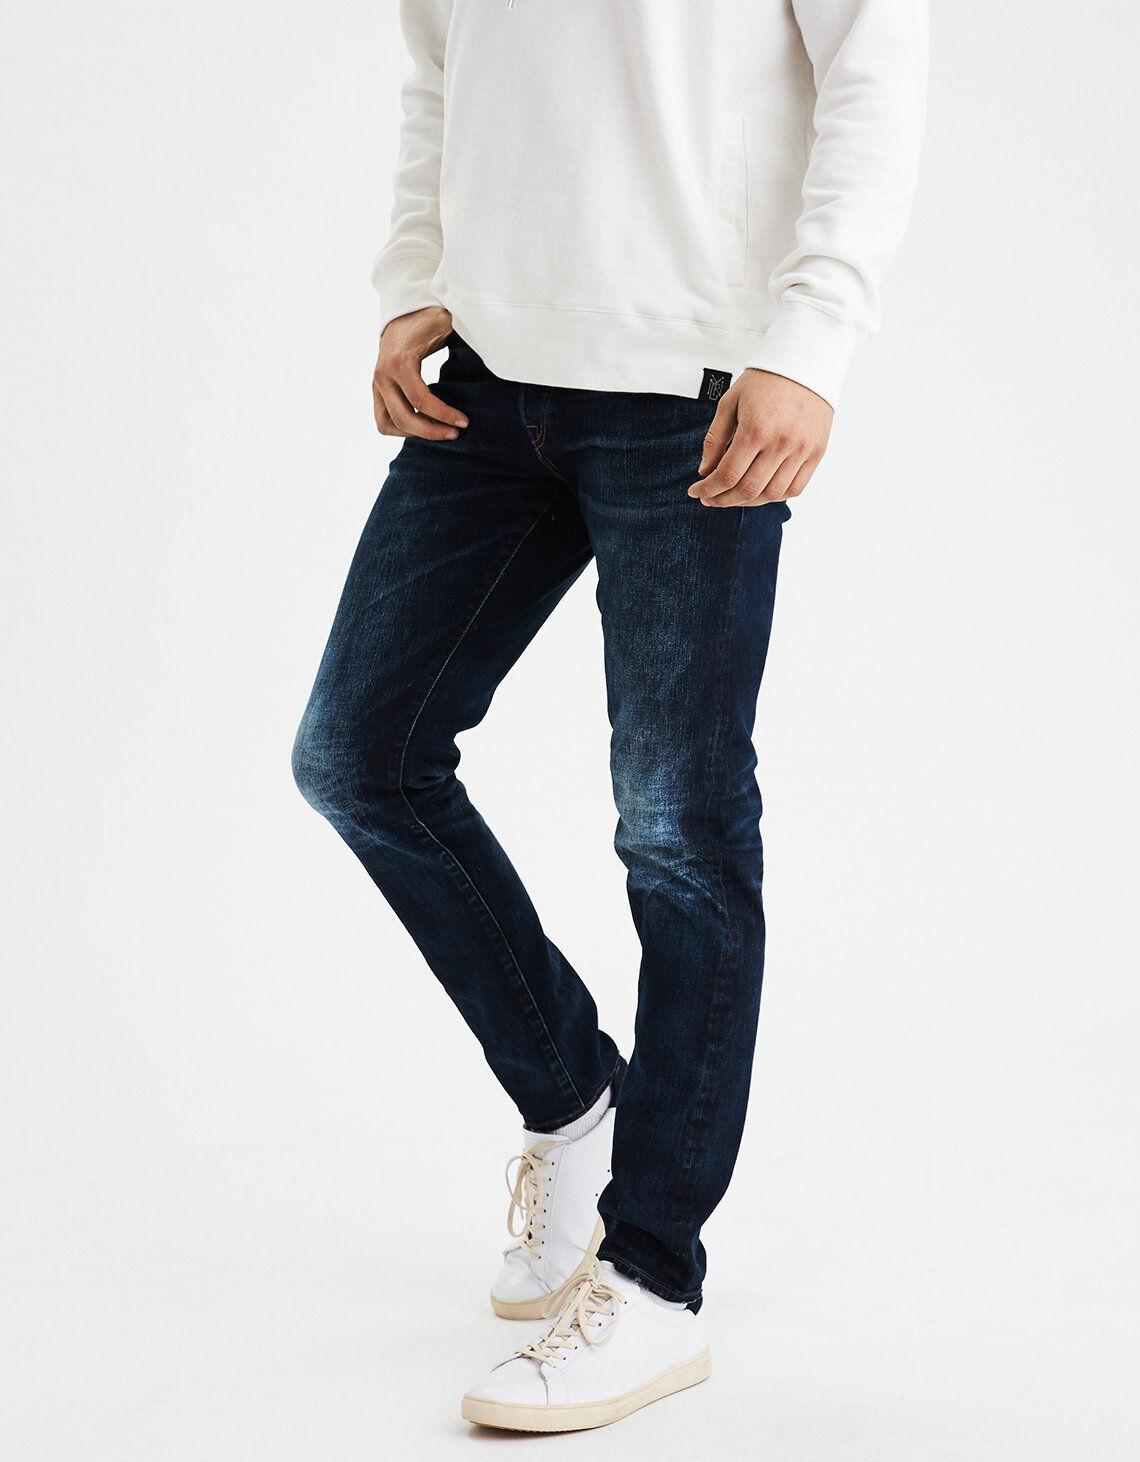 American Eagle Mens-Prämie Kanten Denim Slim Fit Jeans Neu 32x32